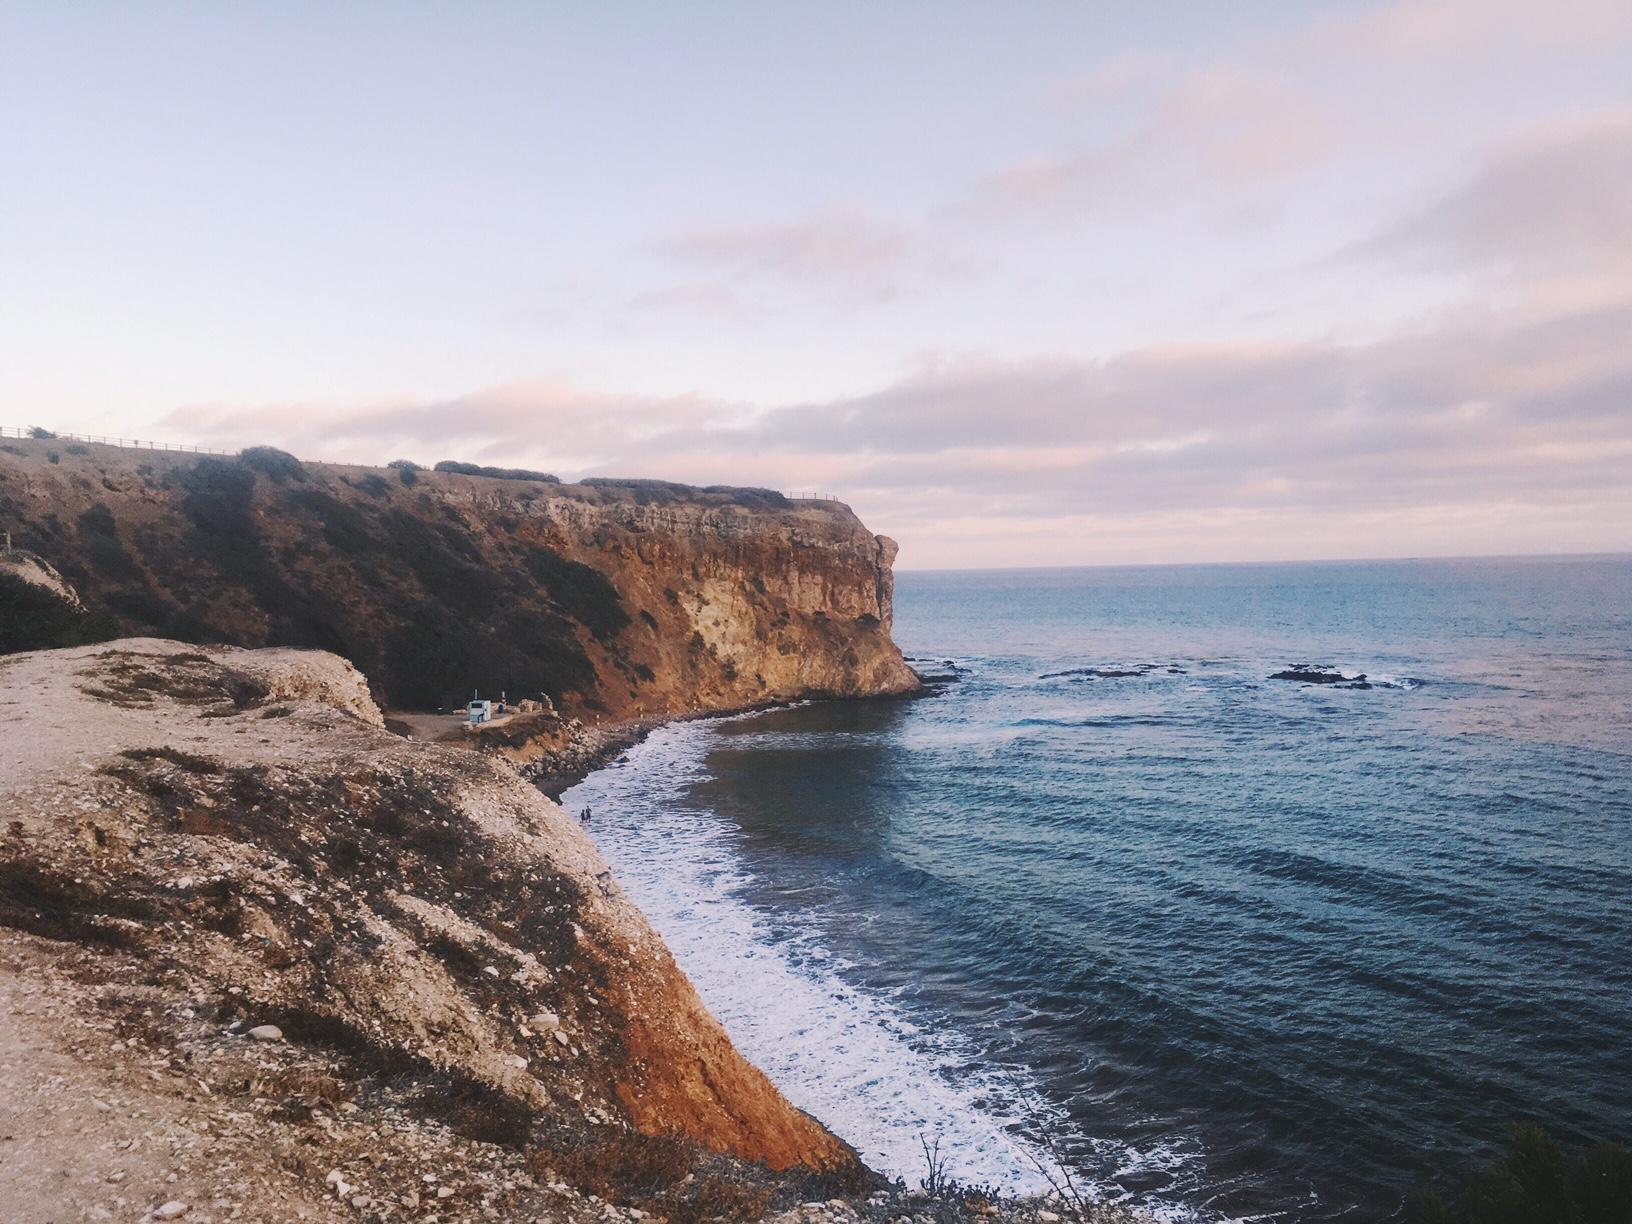 Abalone Cove Reserve in Palos Verdes, CA